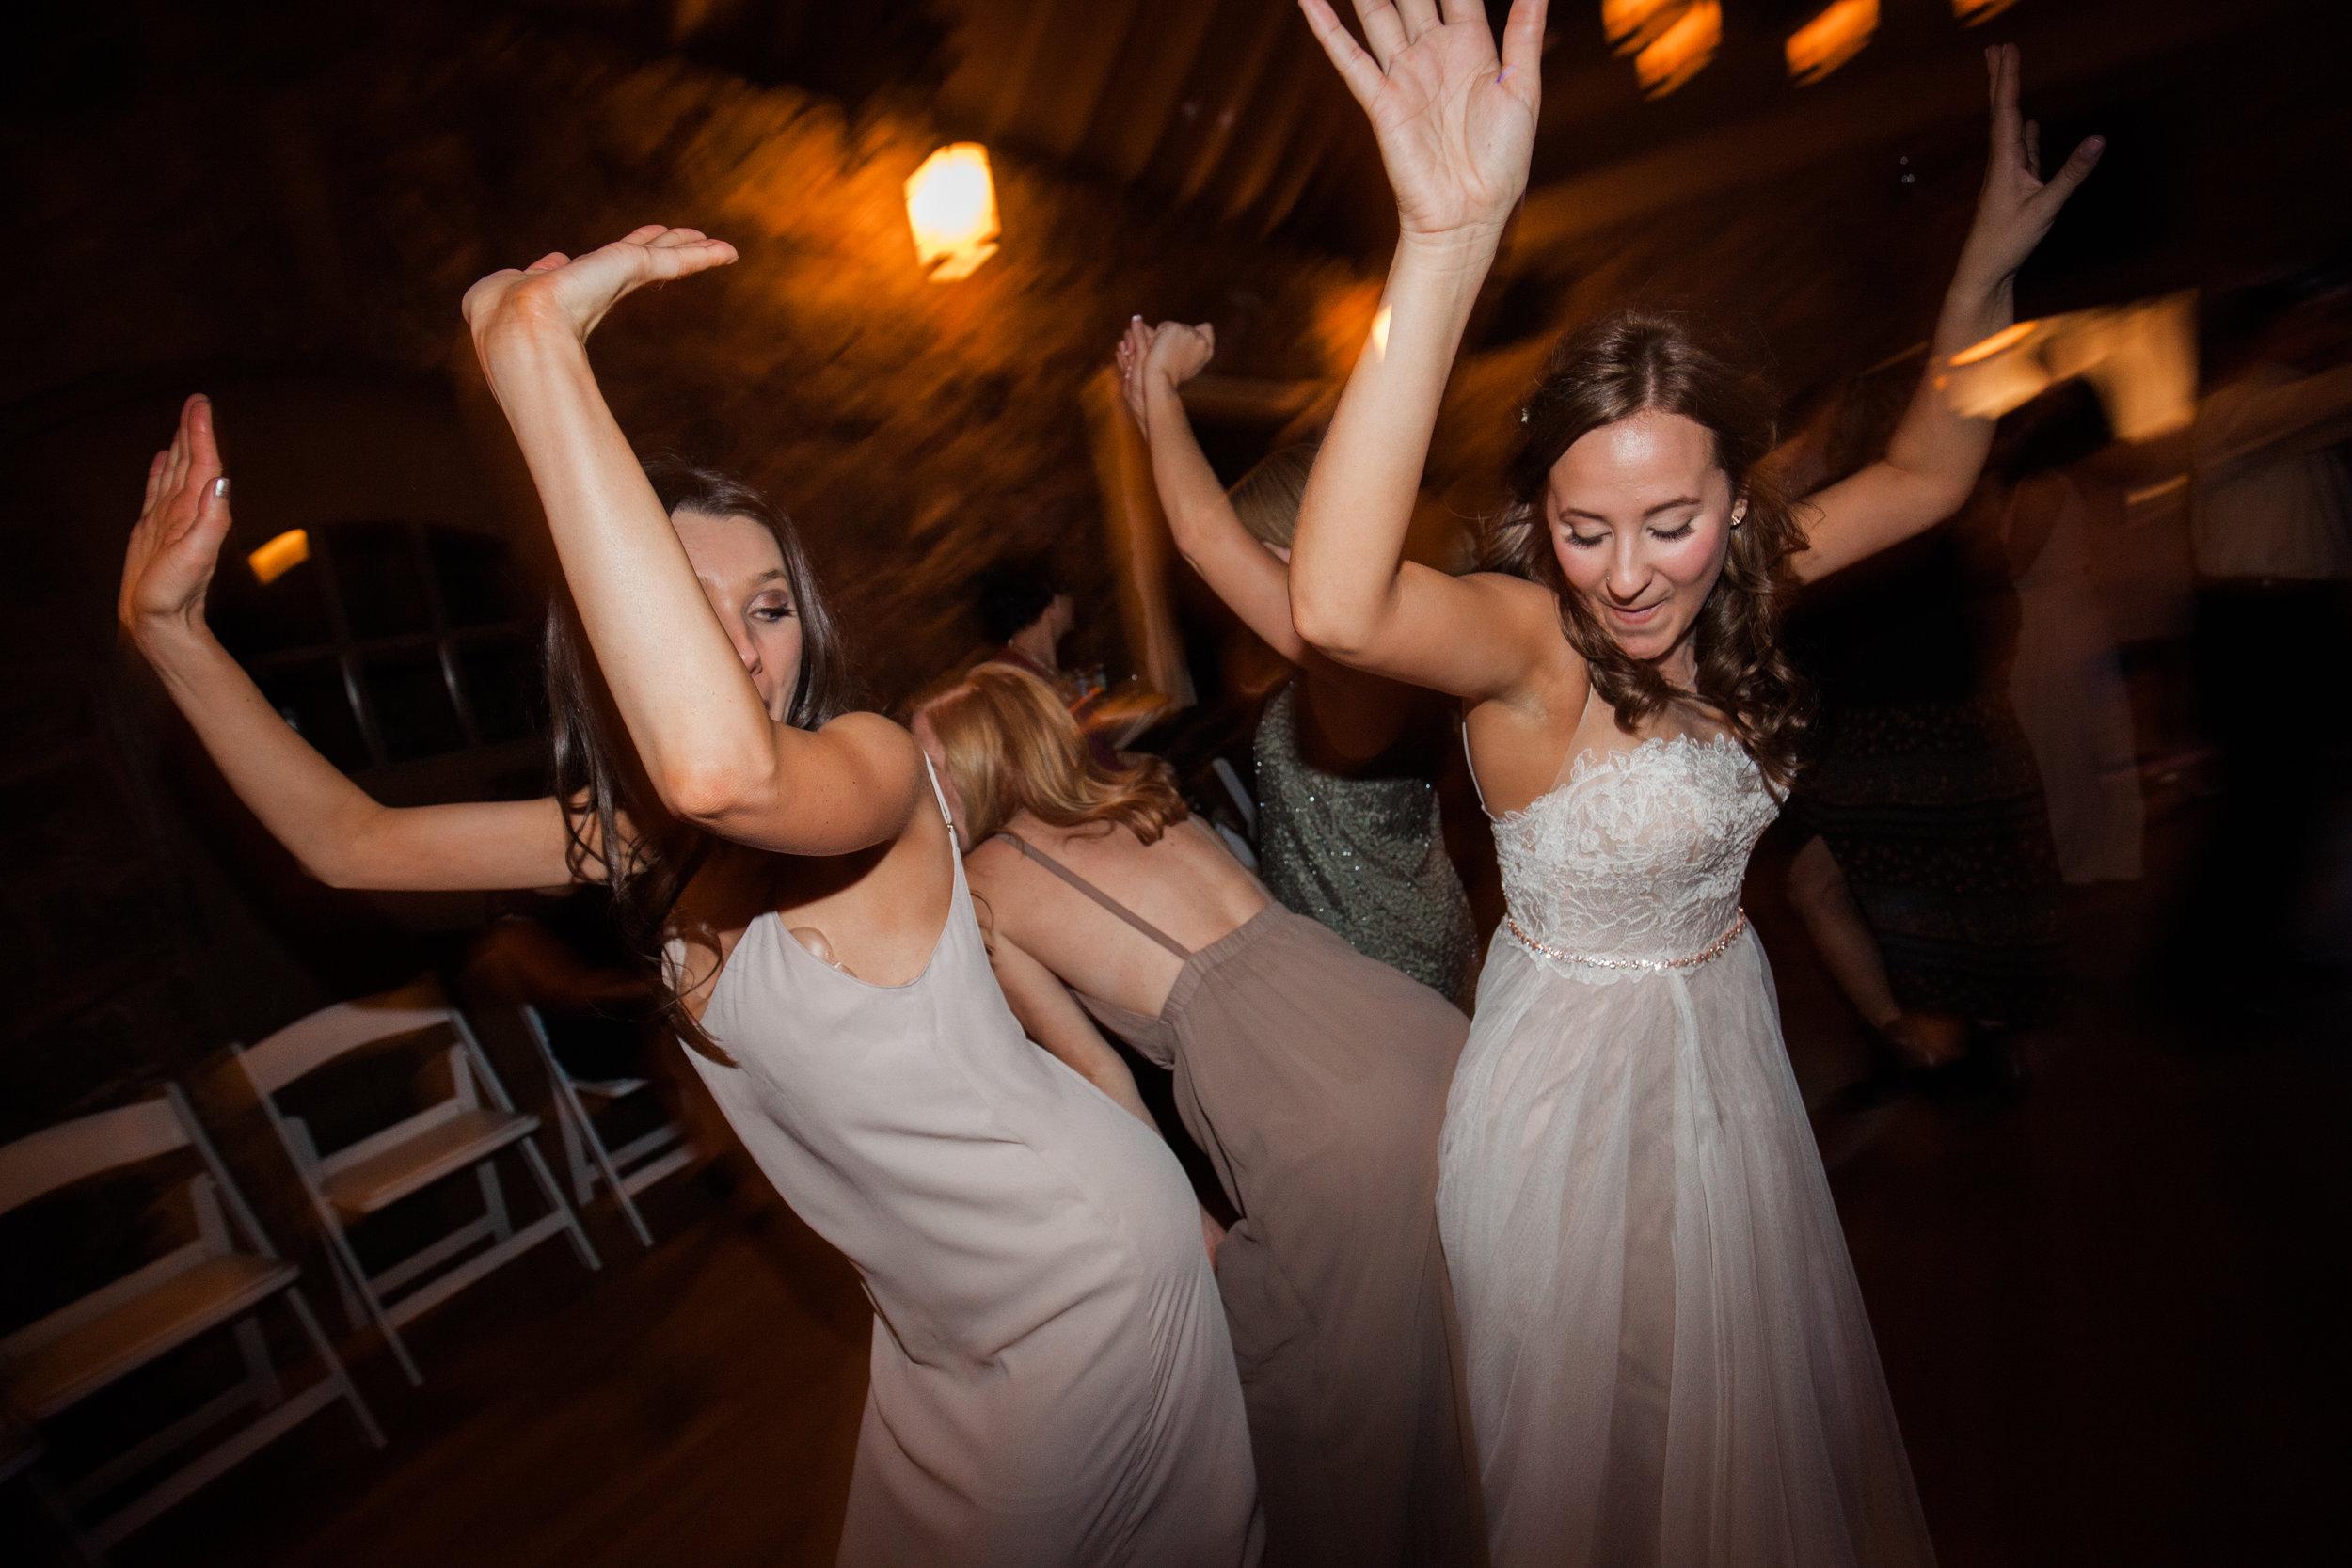 wedding-part-photos.jpg